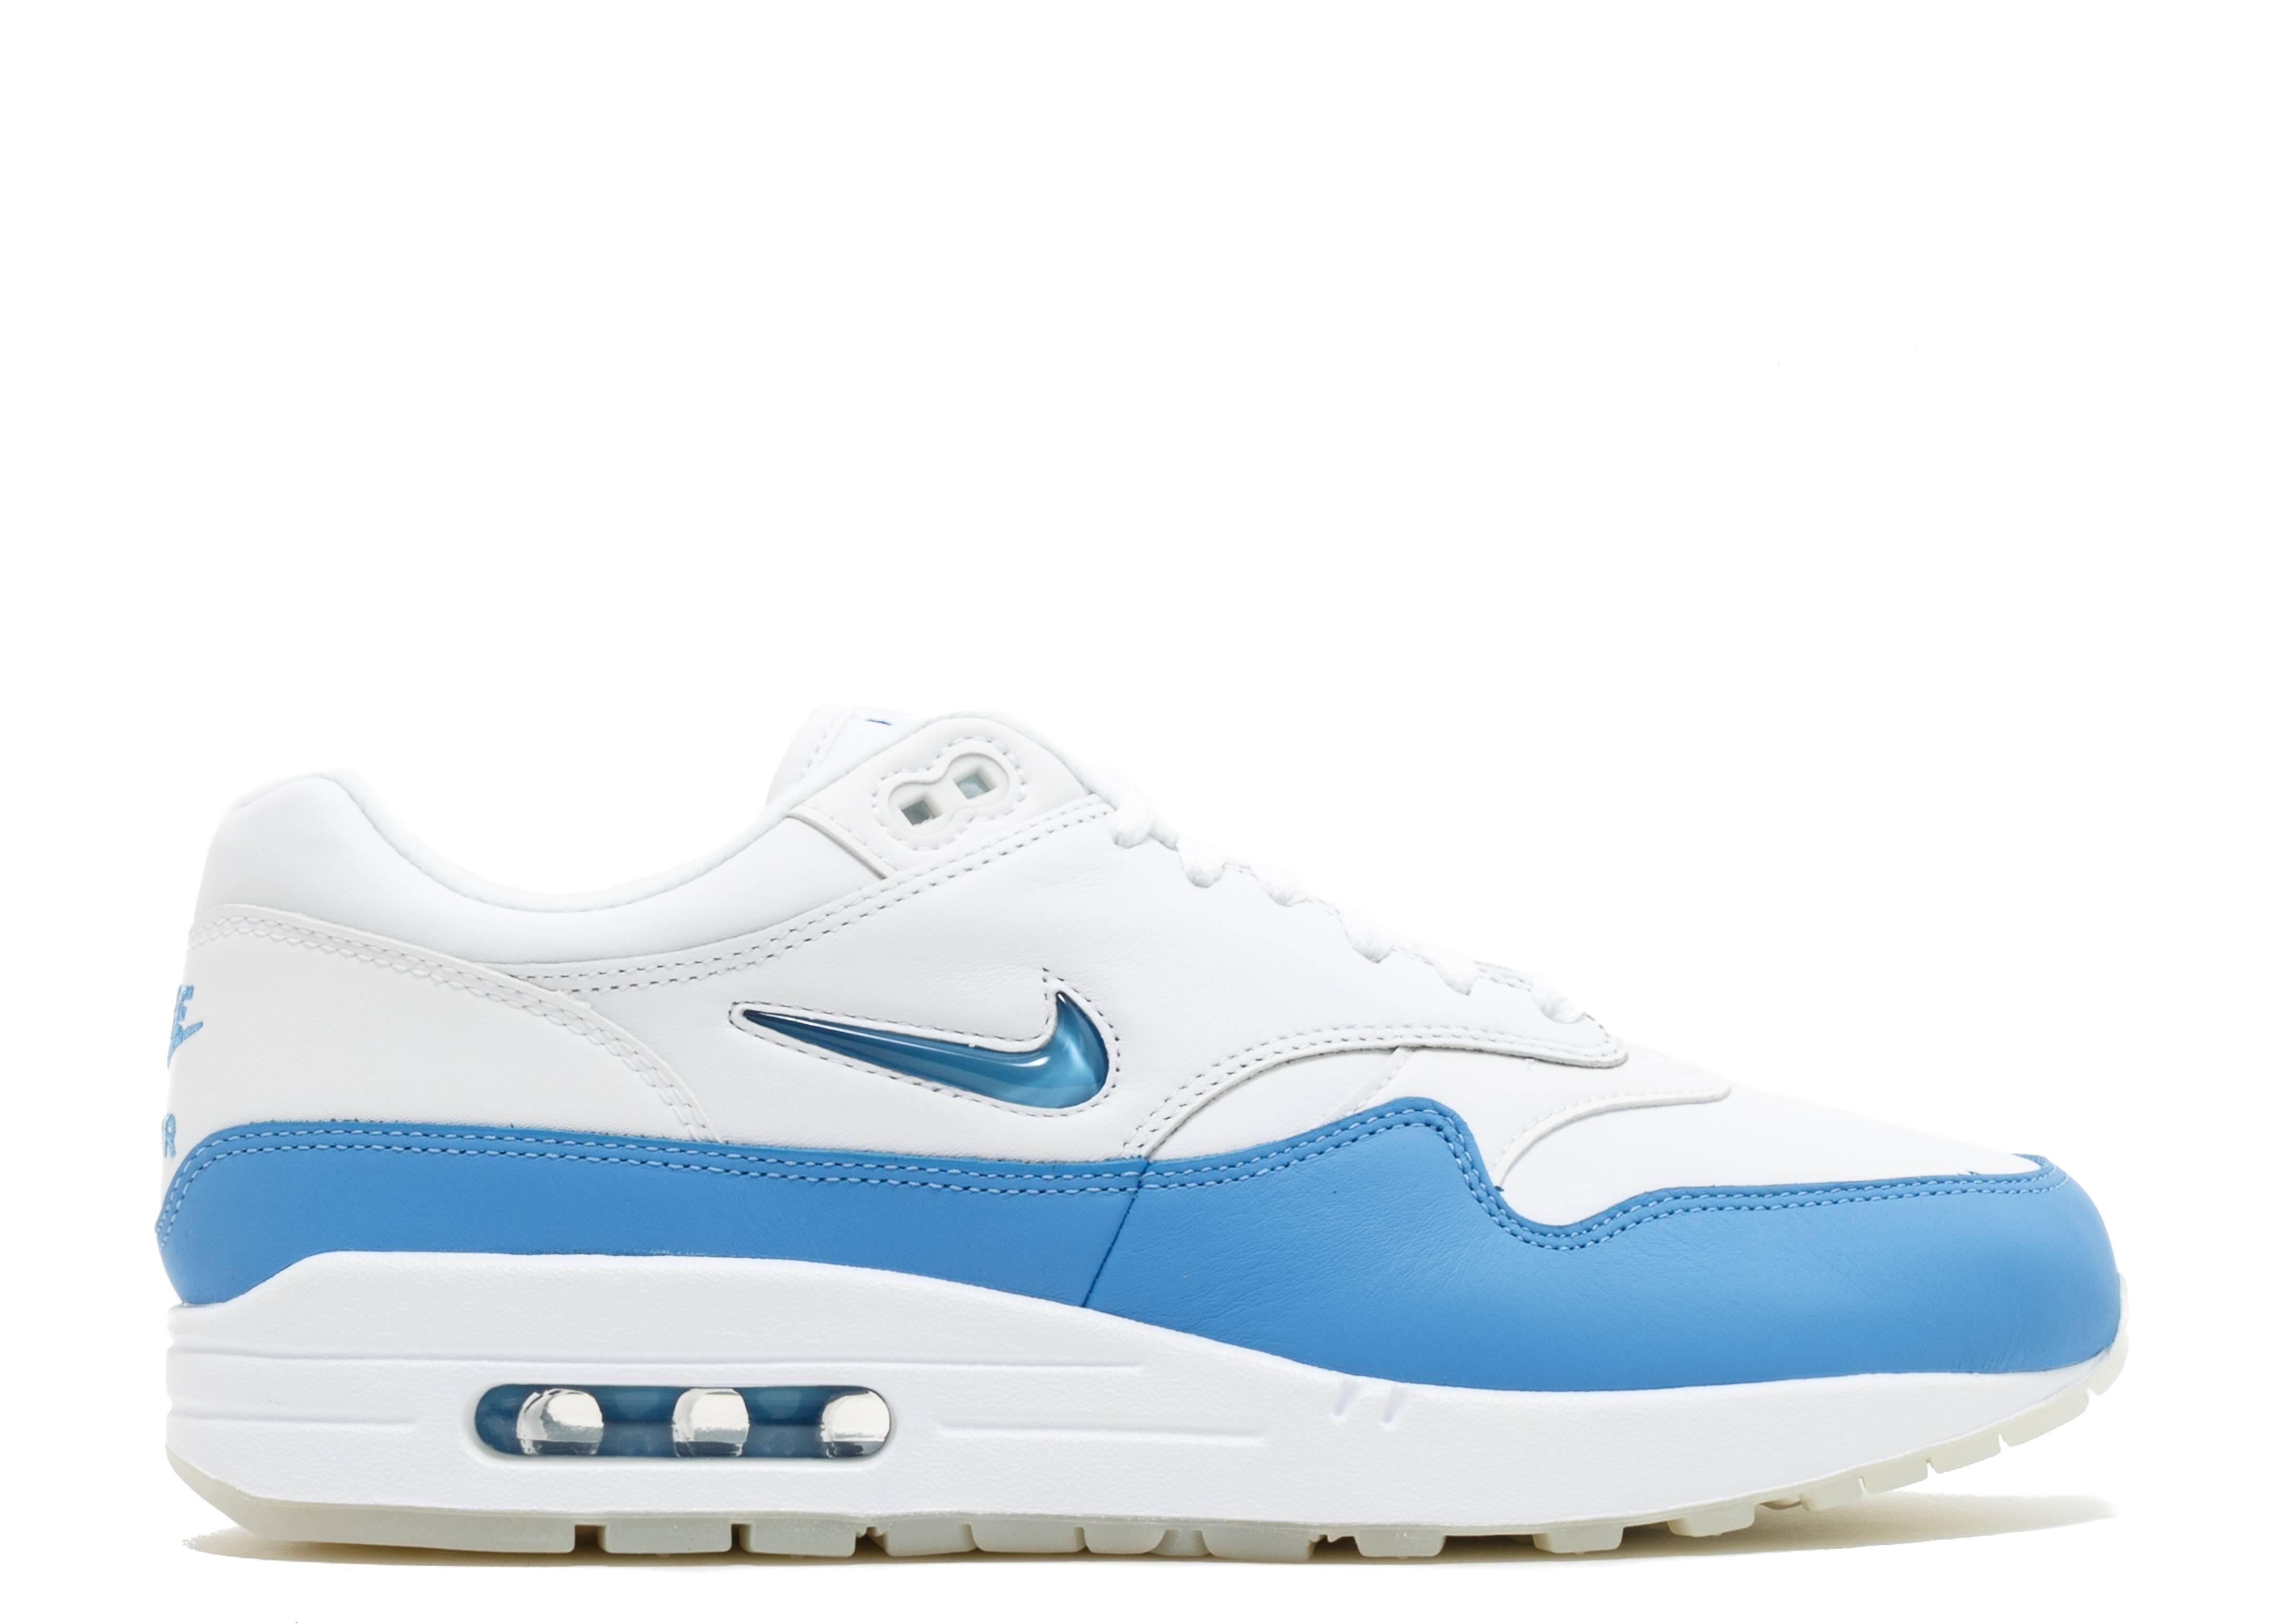 Nike Air Max 1 Sneakers   Flight Club